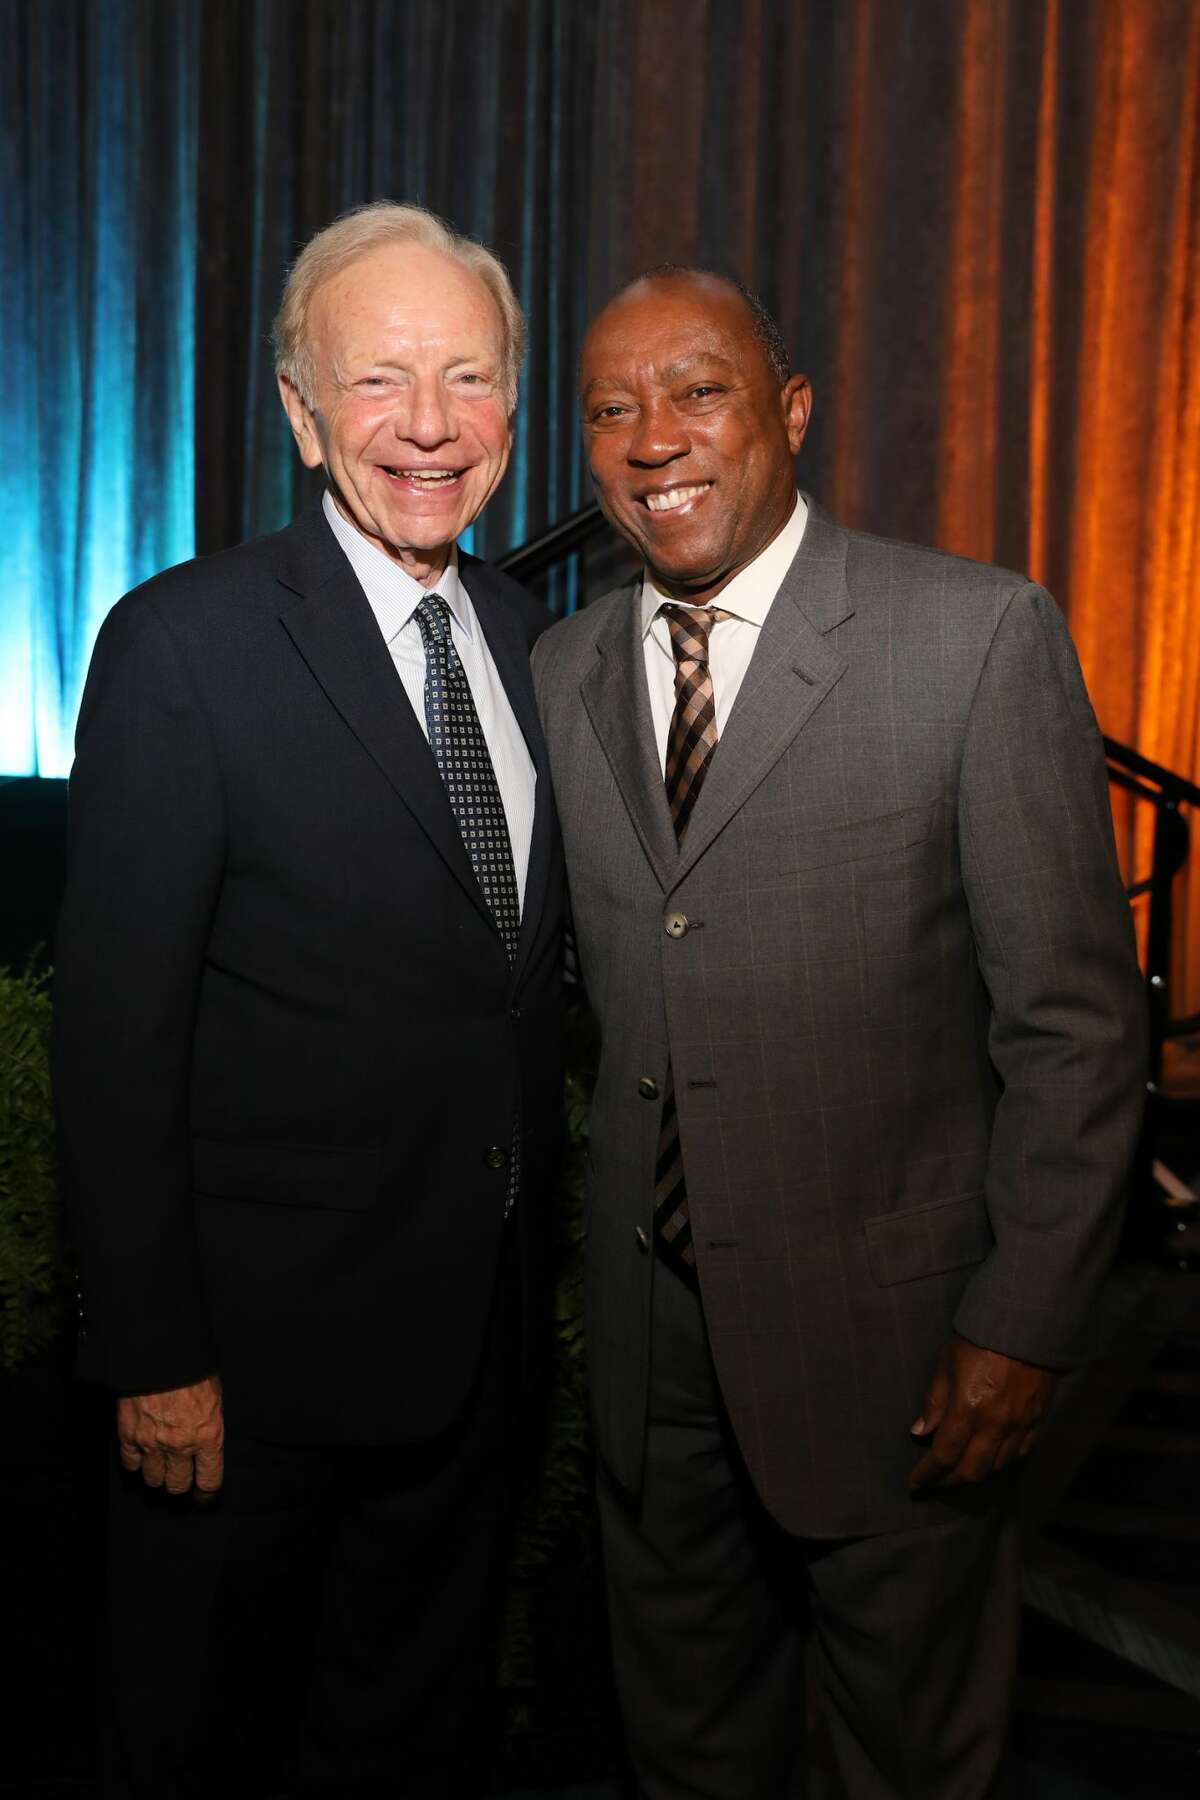 Mayor Sylvester Turner and Sen. Joe Lieberman